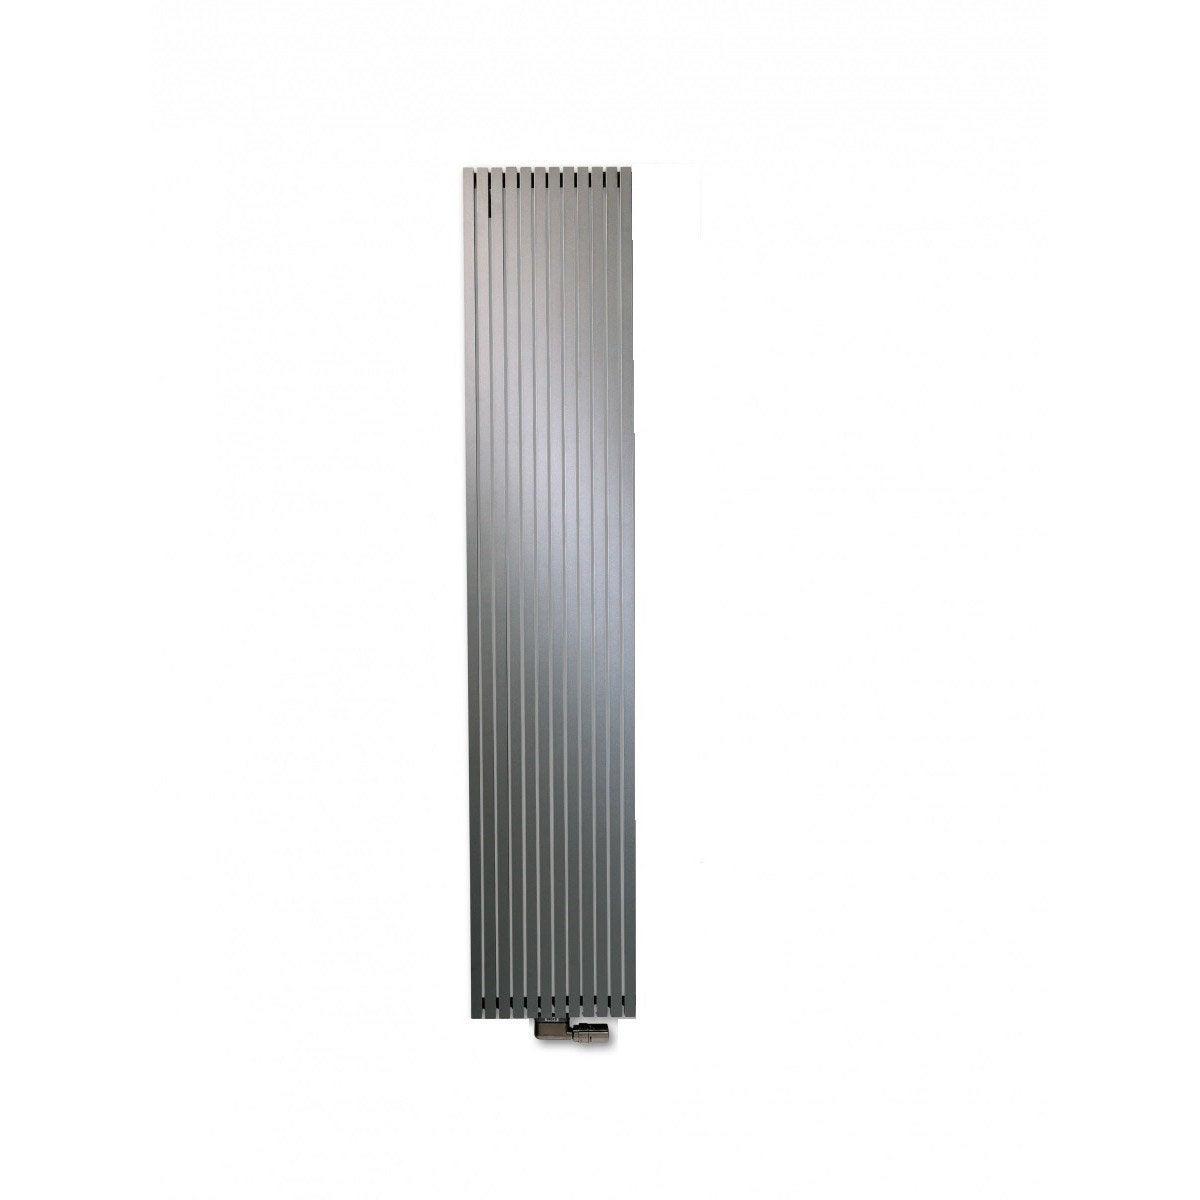 radiateur chauffage central carr gris anthracite sabl cm 1421 w leroy merlin. Black Bedroom Furniture Sets. Home Design Ideas